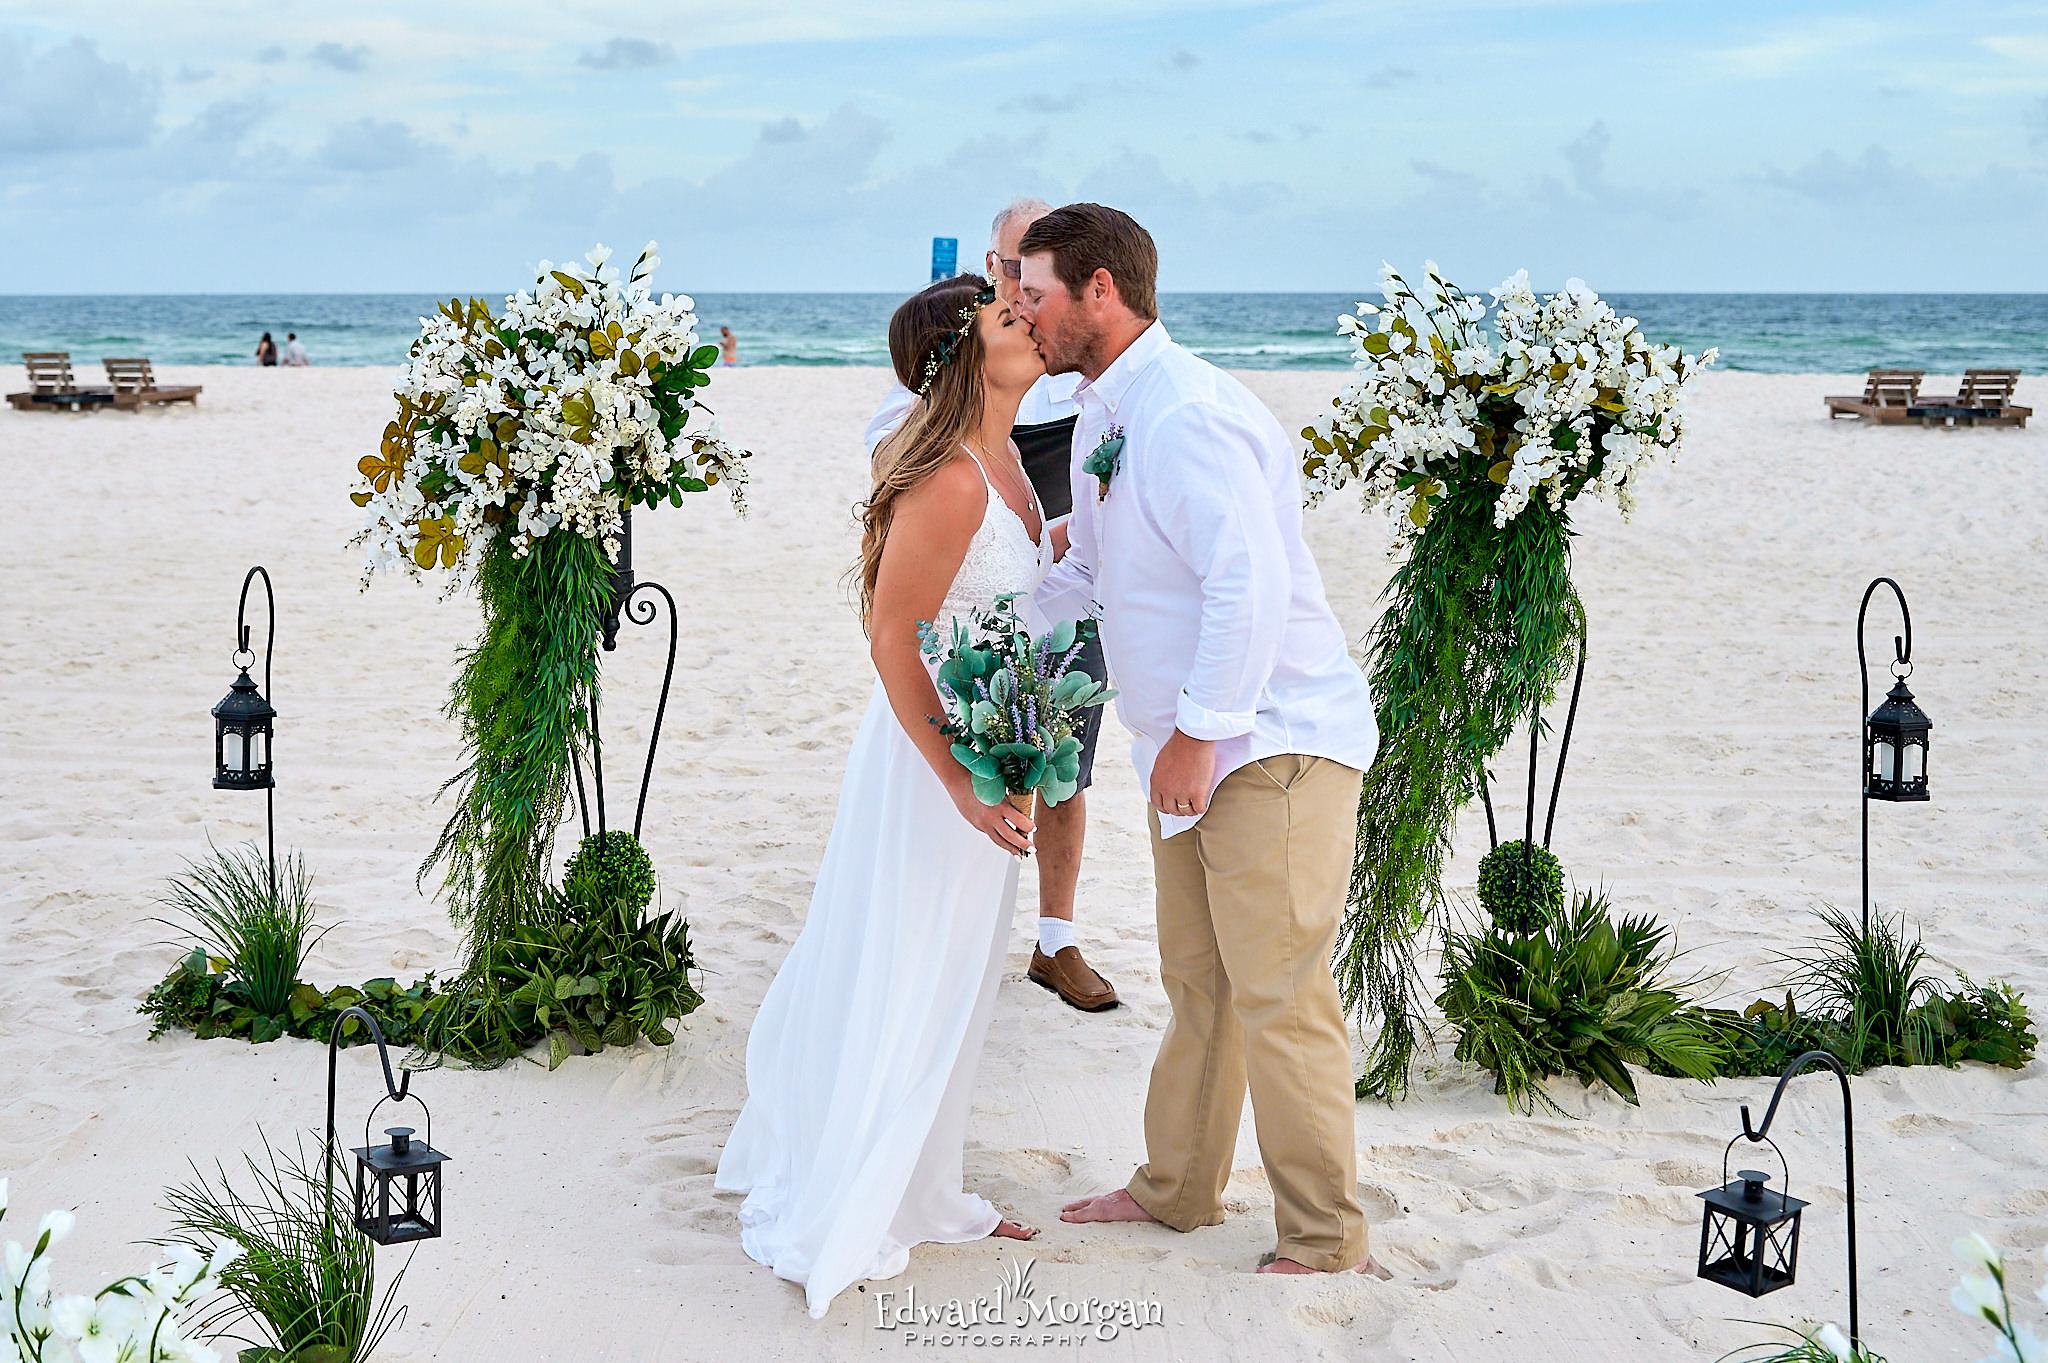 Gulf Shores Beach Photographer Z61 9713